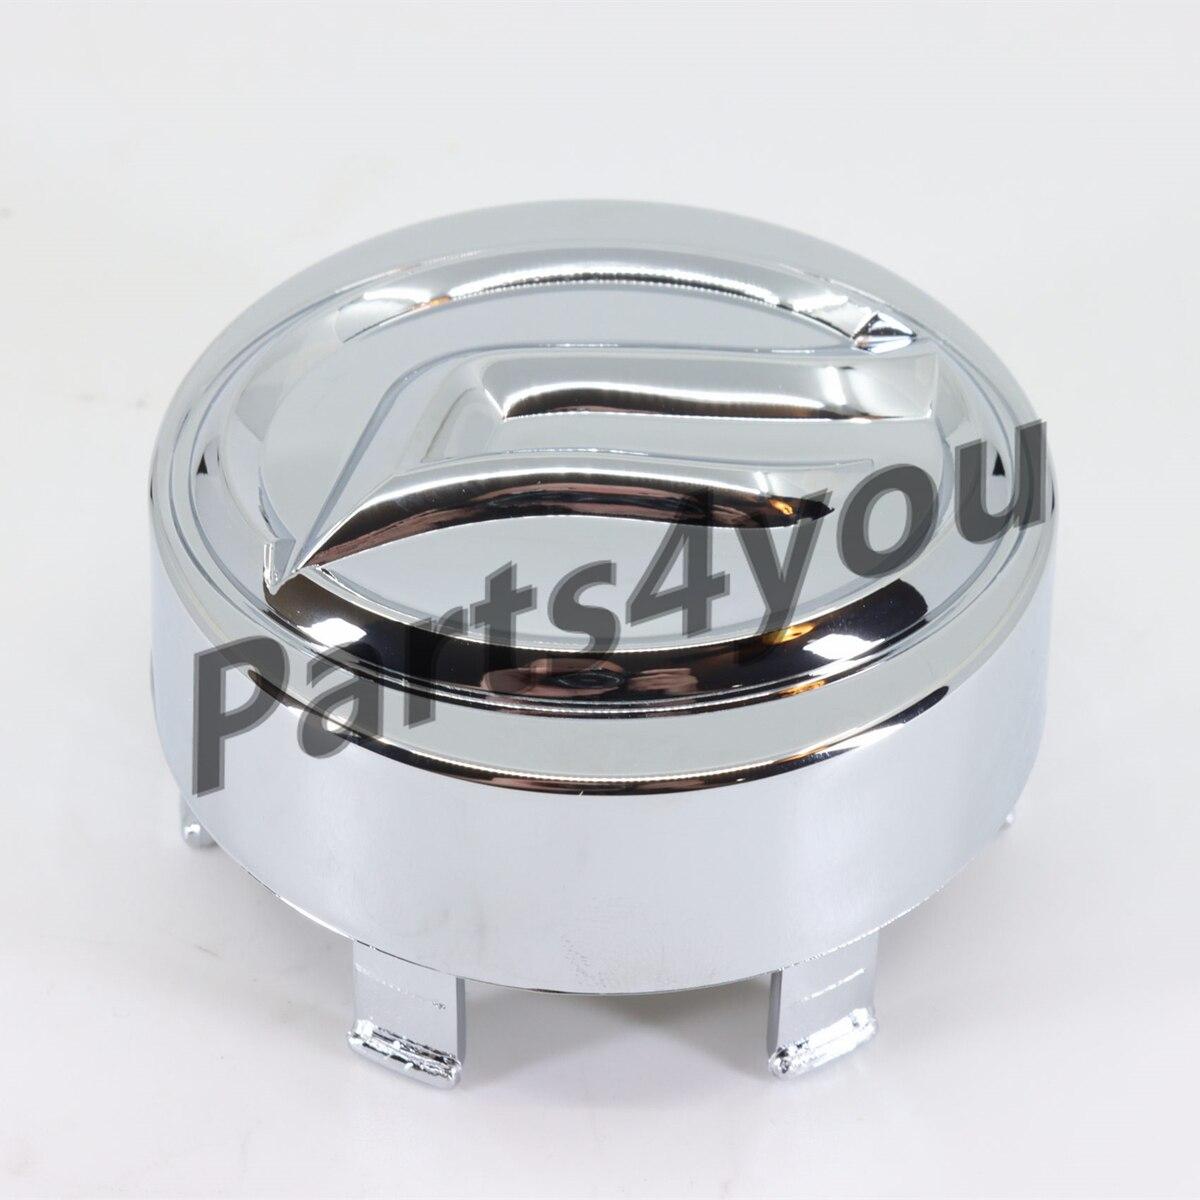 Alum Rim Deco Cap for CFmoto CF1000 CFORCE 1000 CF400 CFORCE 400S 450 CF500 X5 520 550 CF600 600 625 X6 CF800 7020-070101-1000 enlarge